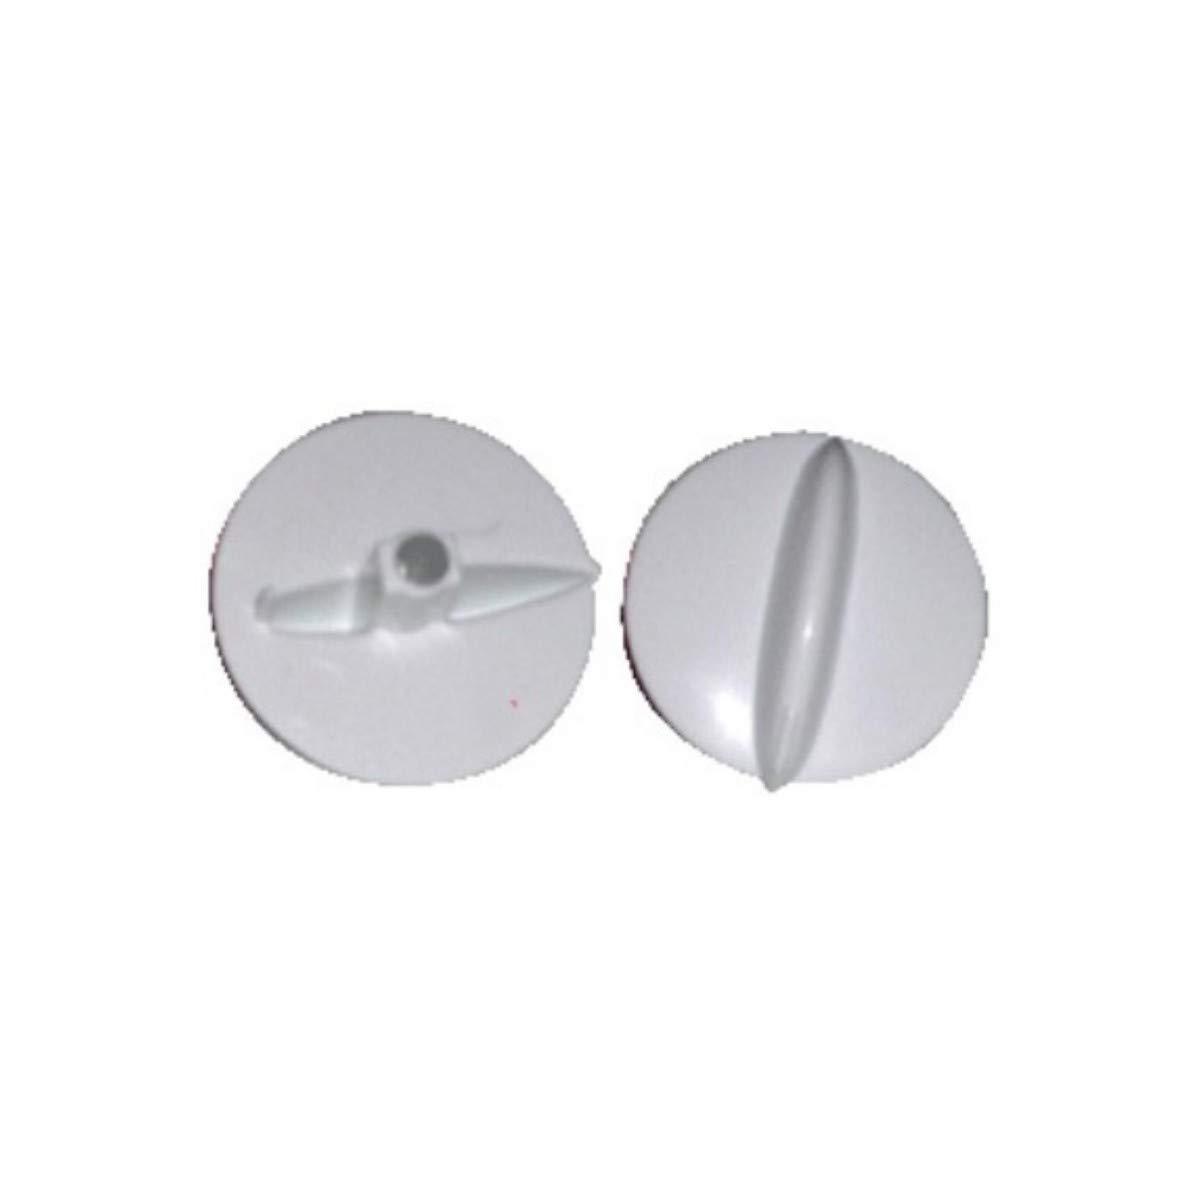 Recamania Mando microondas Moulinex Blanco Eje 6mm